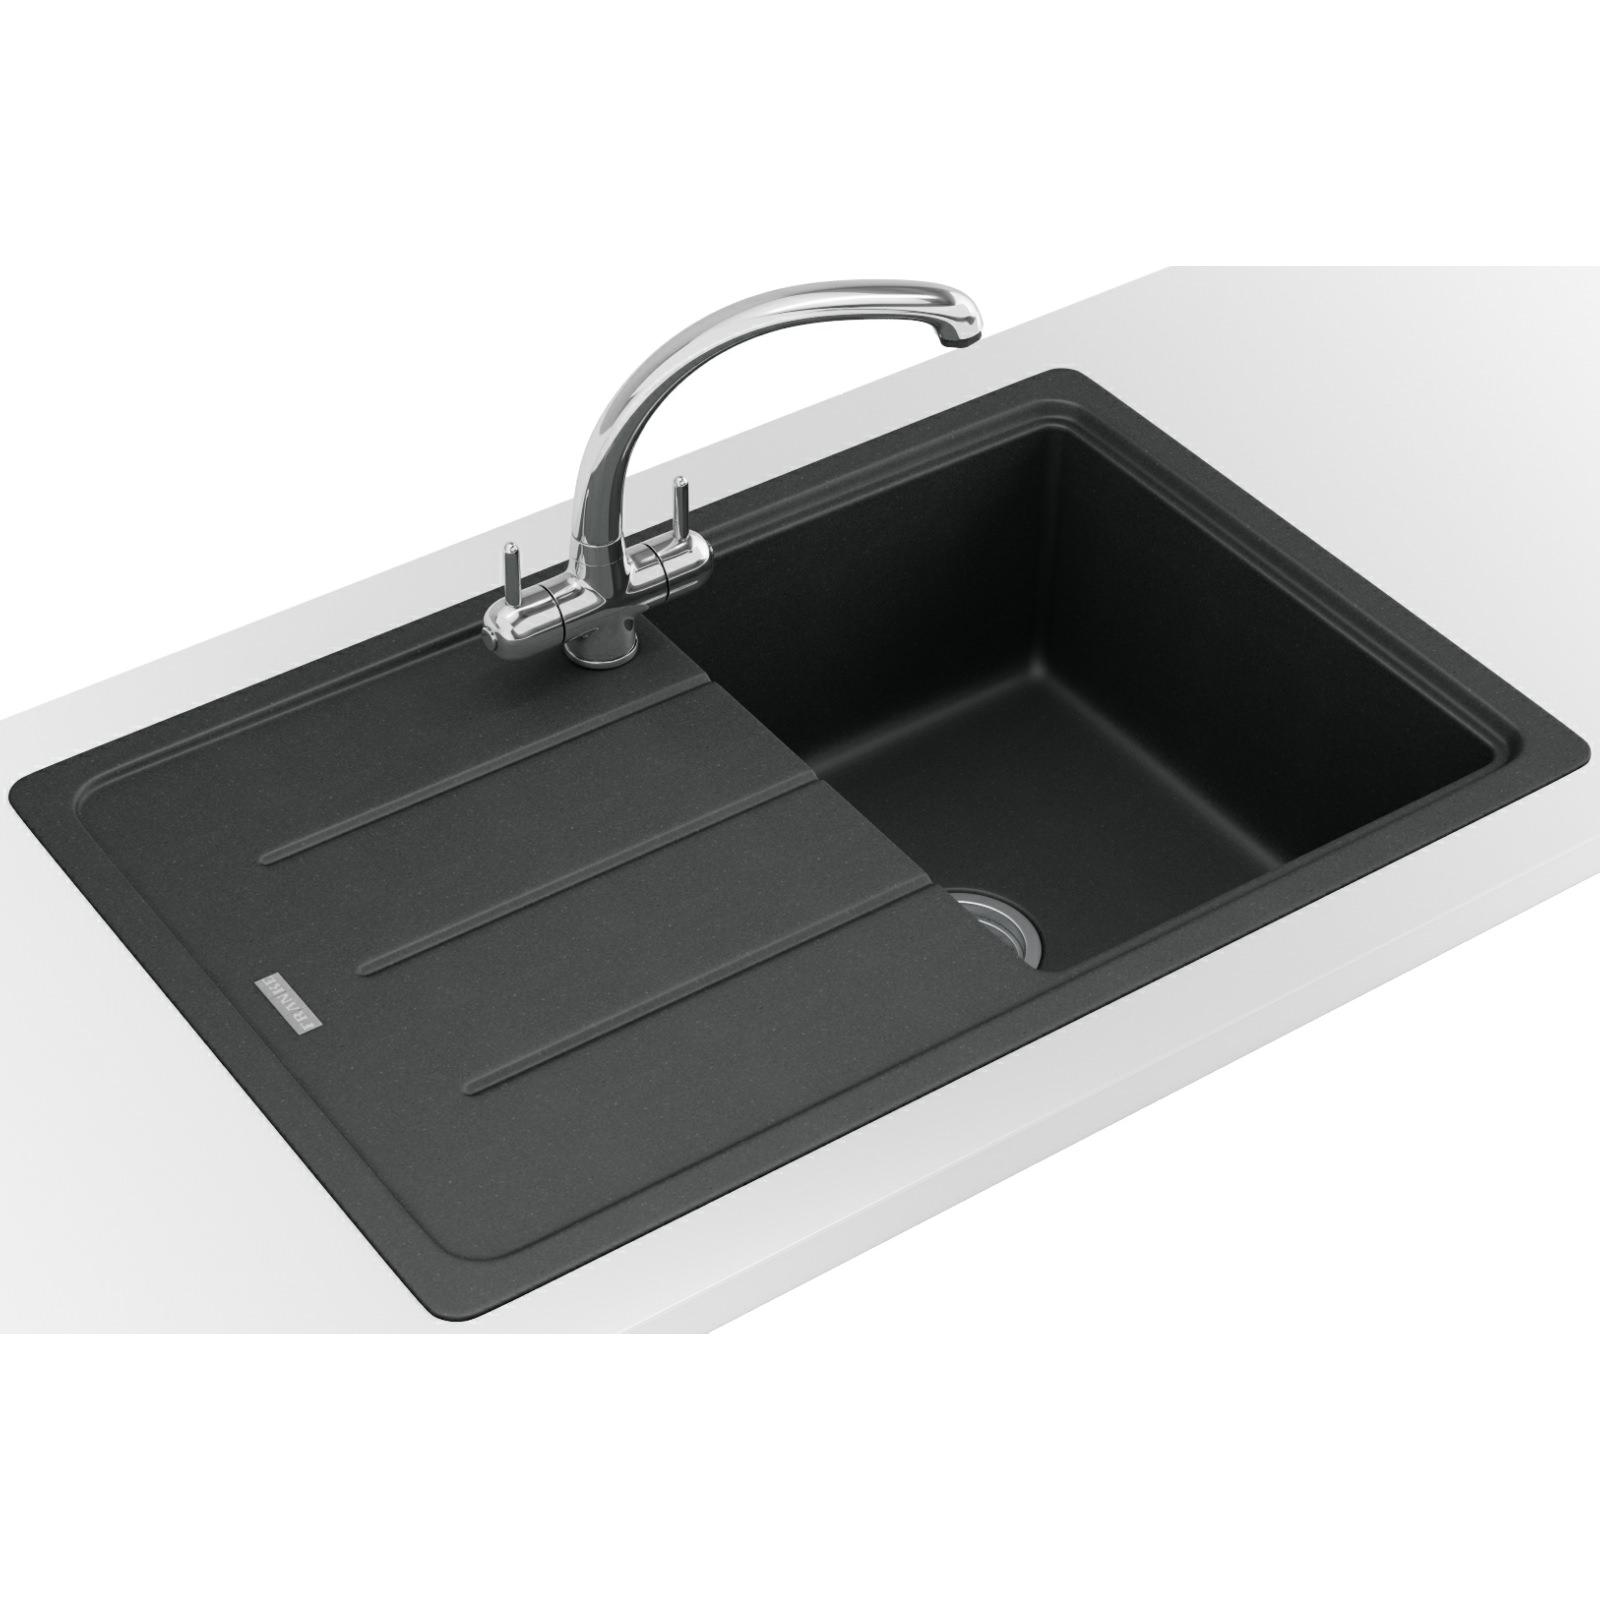 franco kitchen sinks booster seat franke basis bfg 611 780 fragranite onyx 1 bowl inset